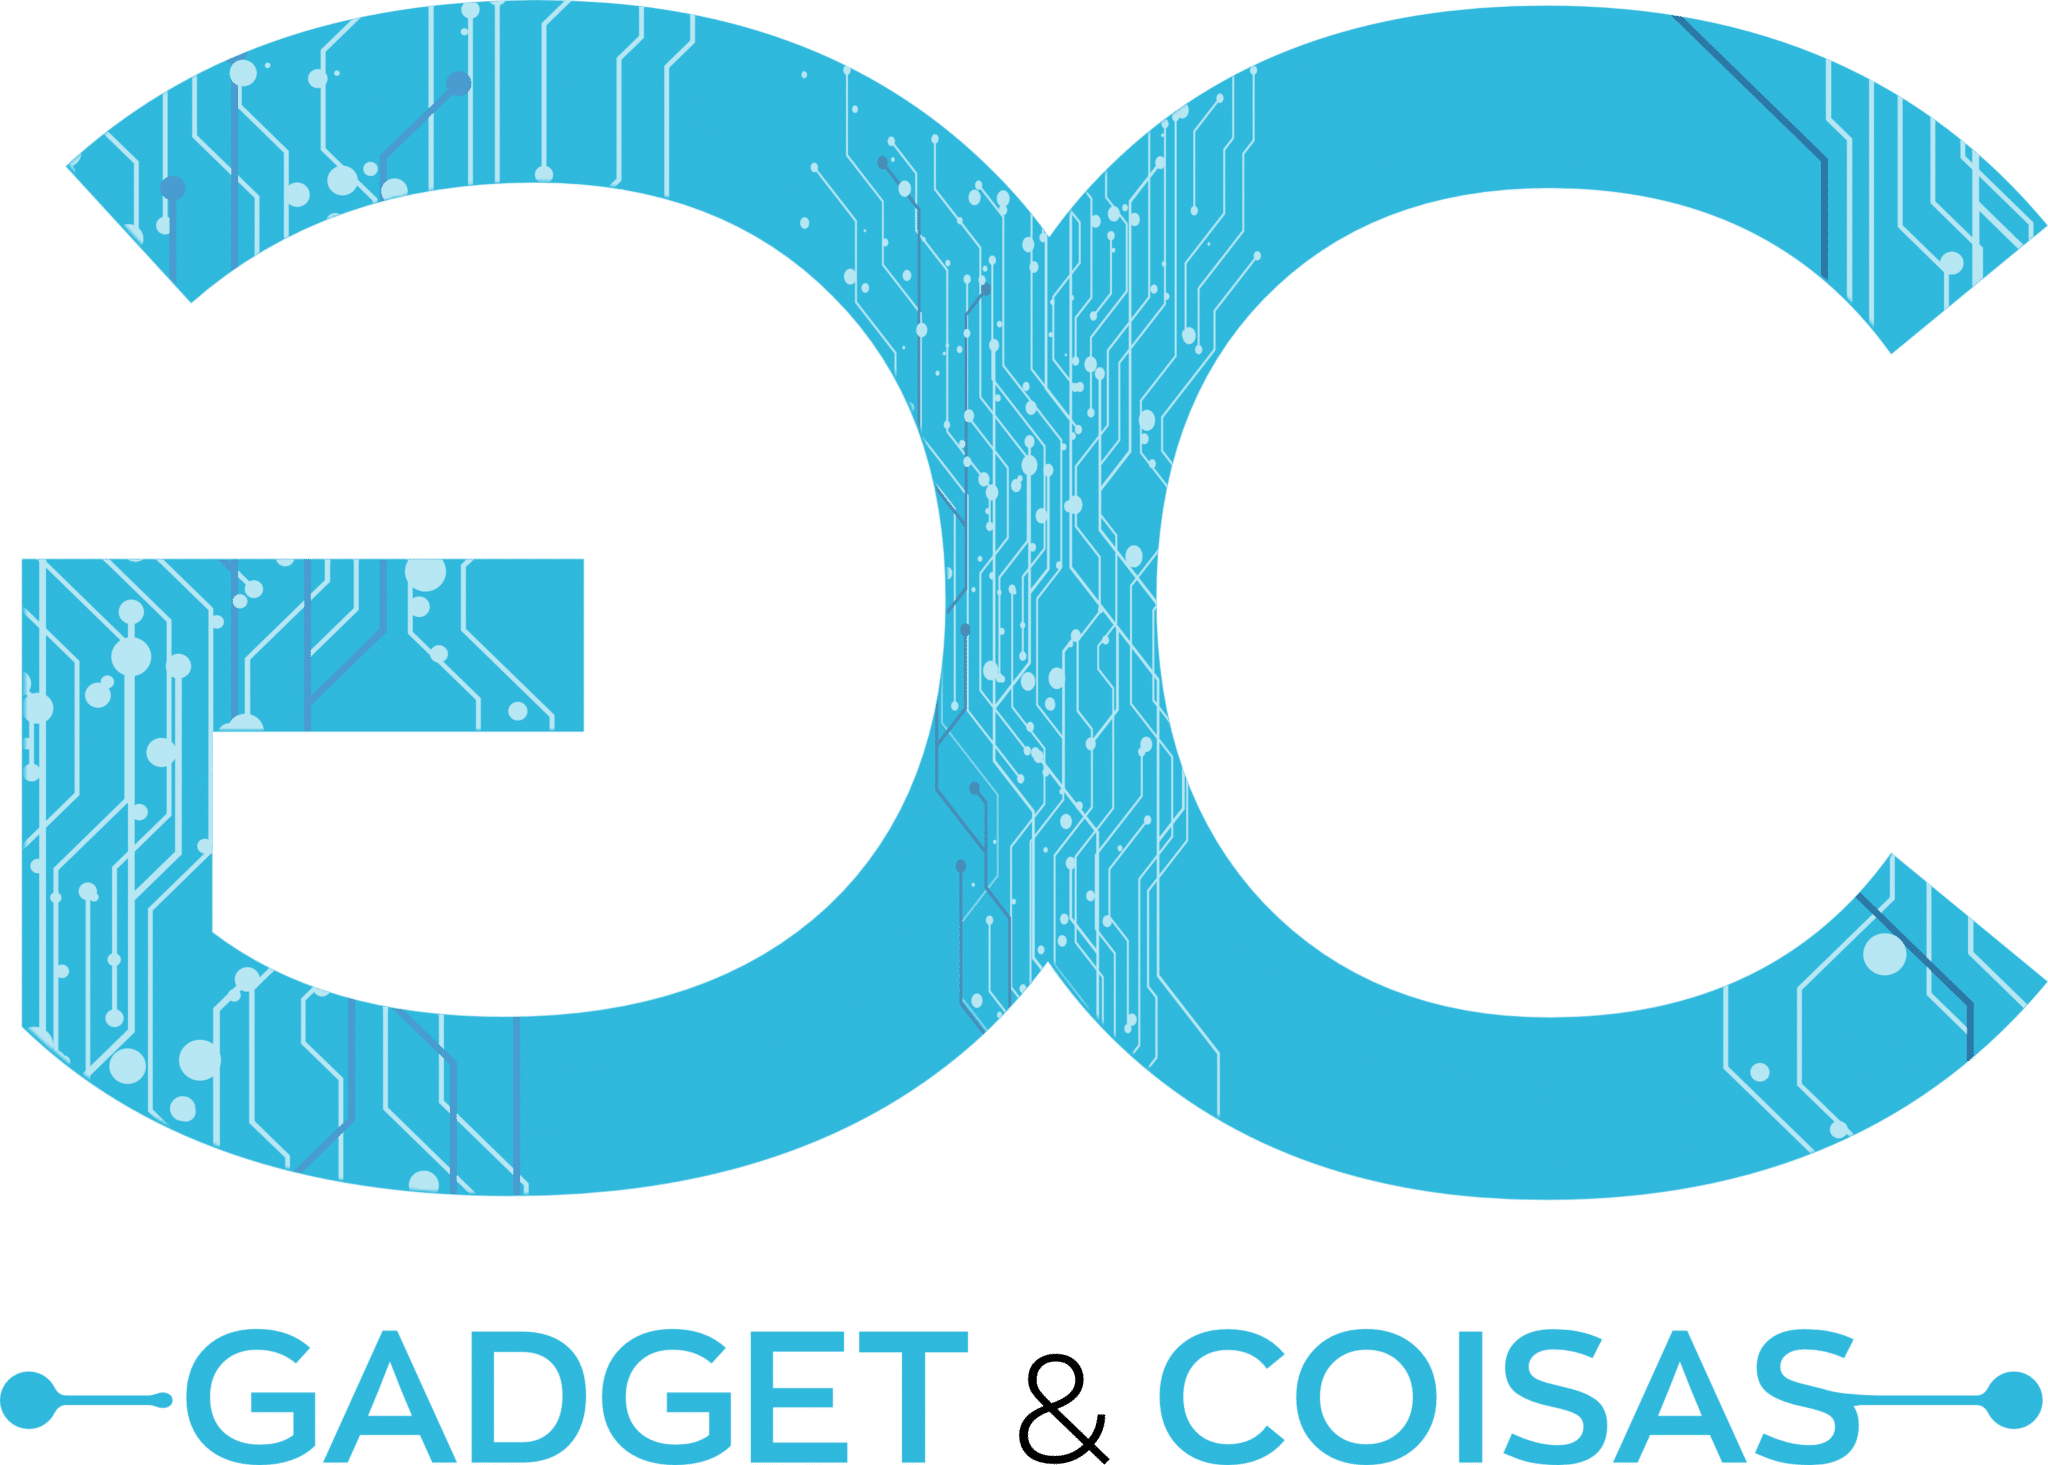 Gadgets & Coisas